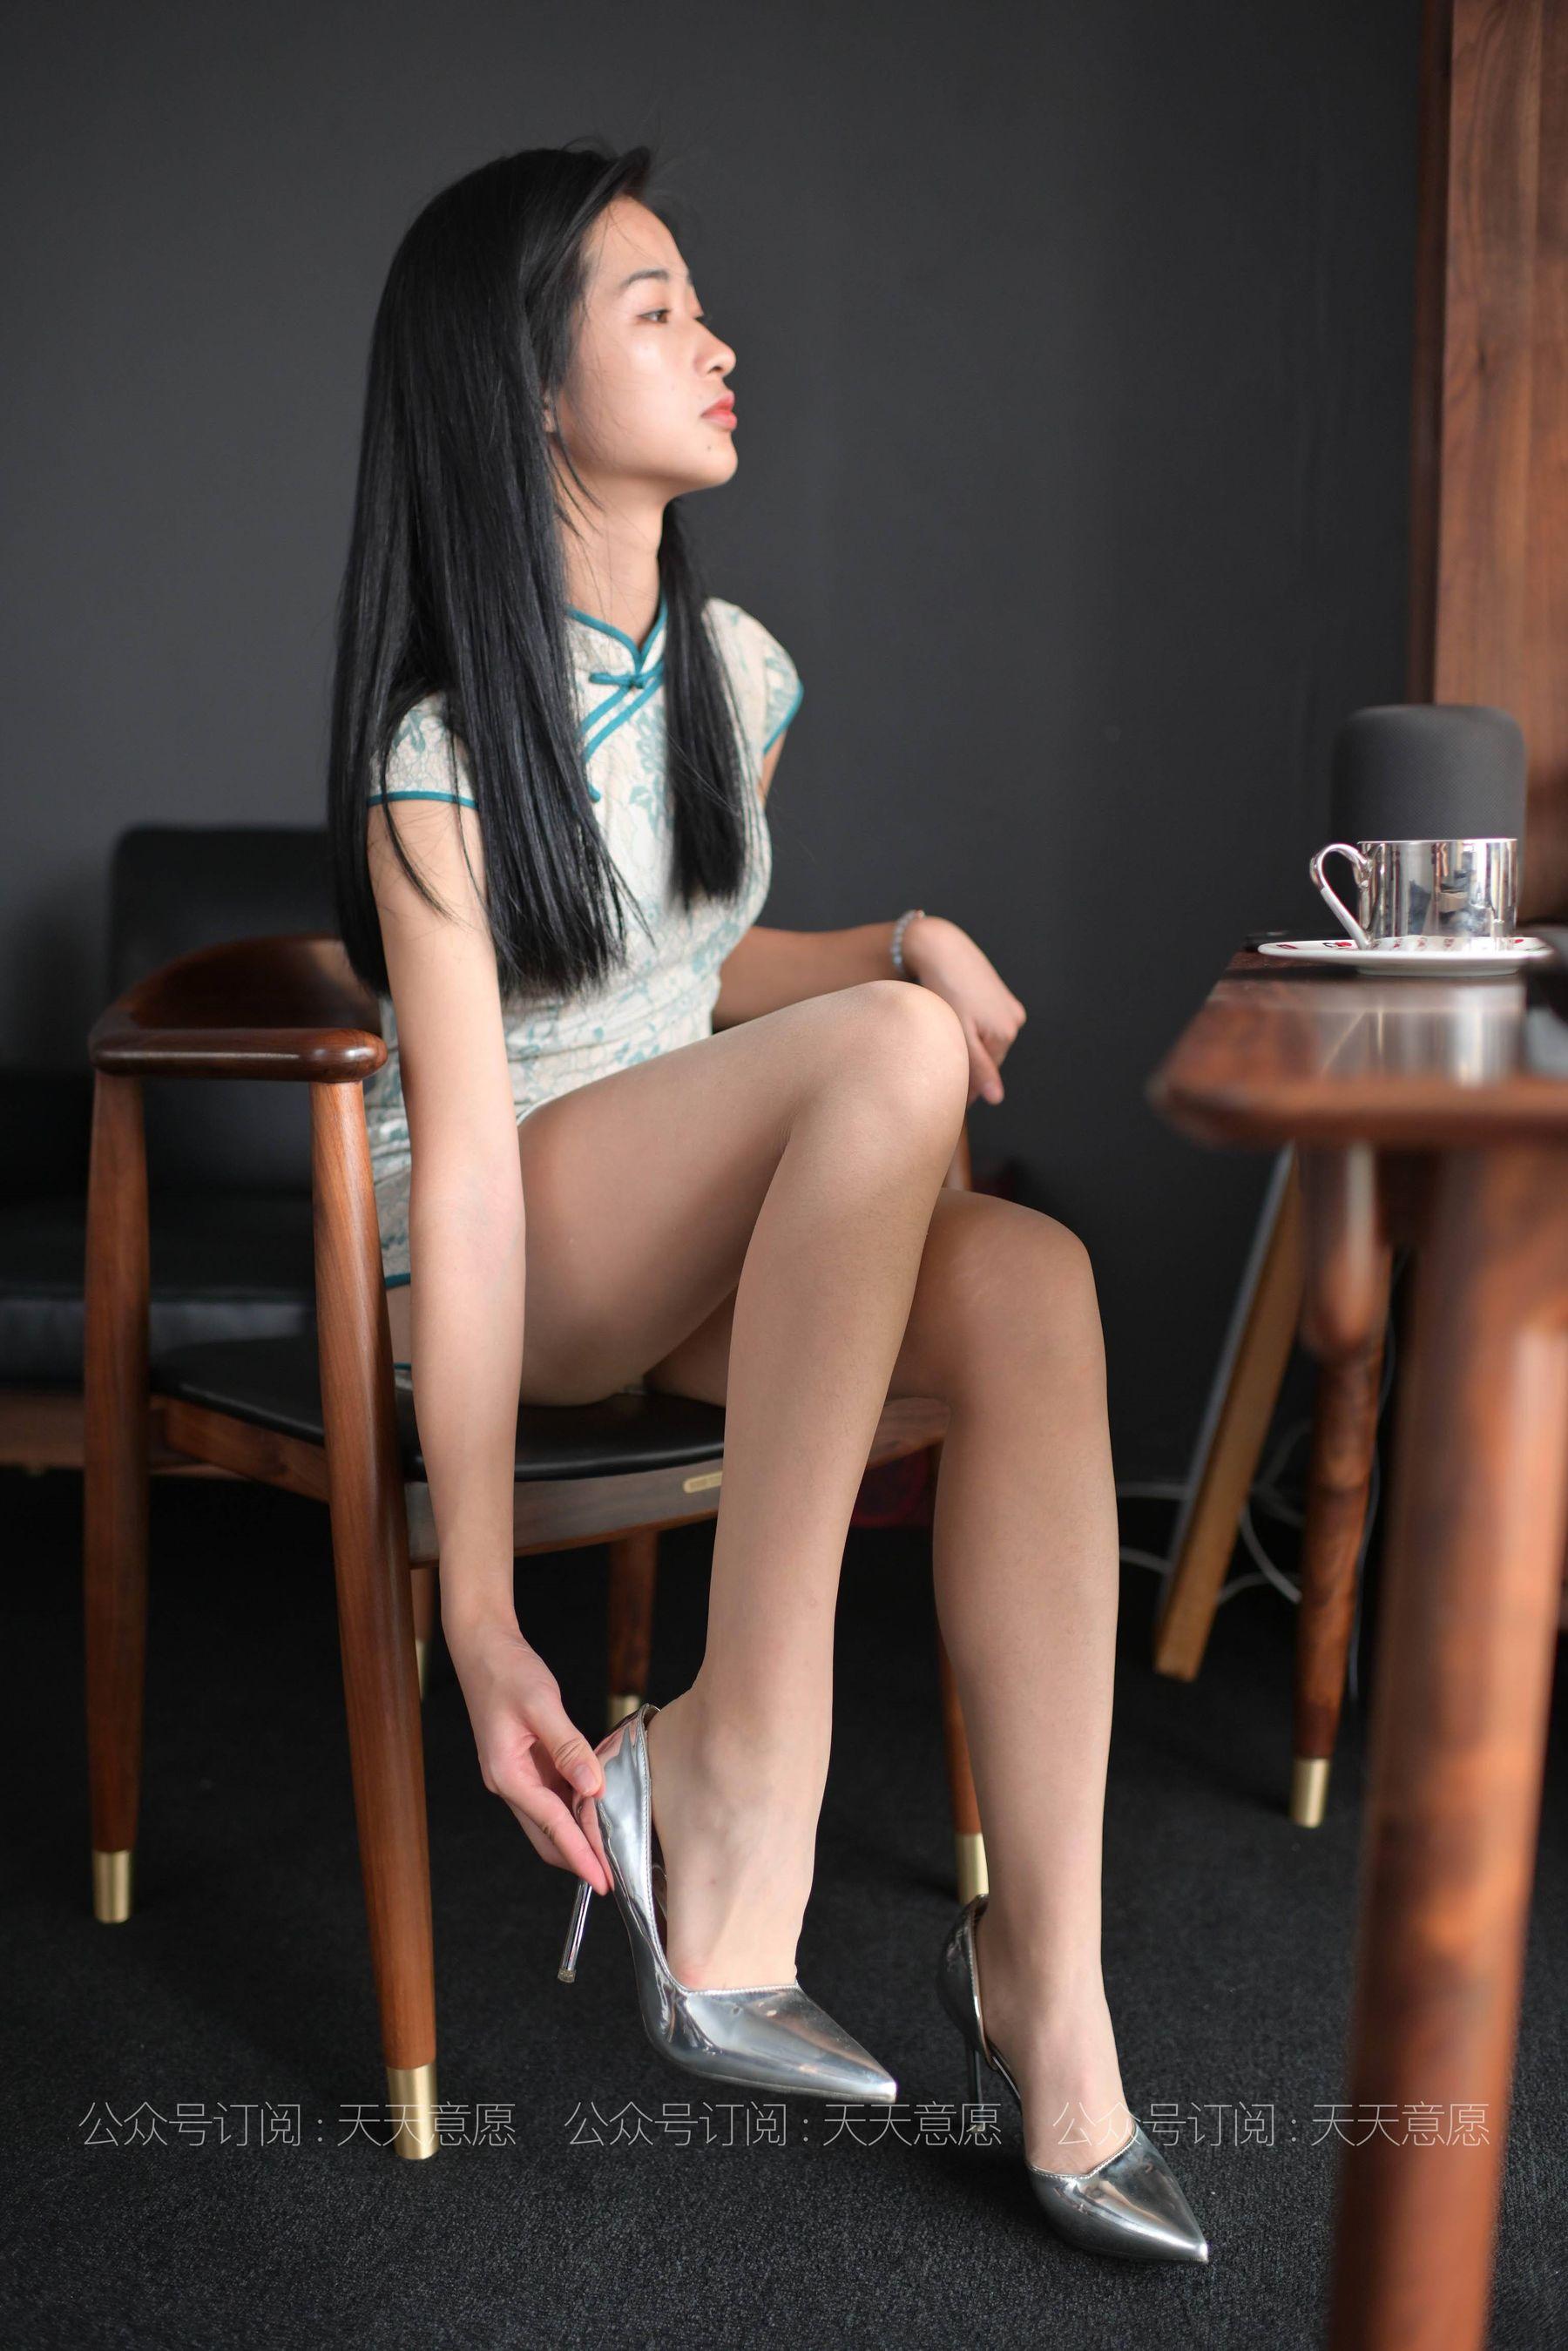 [IESS] 丝享家788: 宁宁《爱看书的旗袍美女》[77P]插图(7)